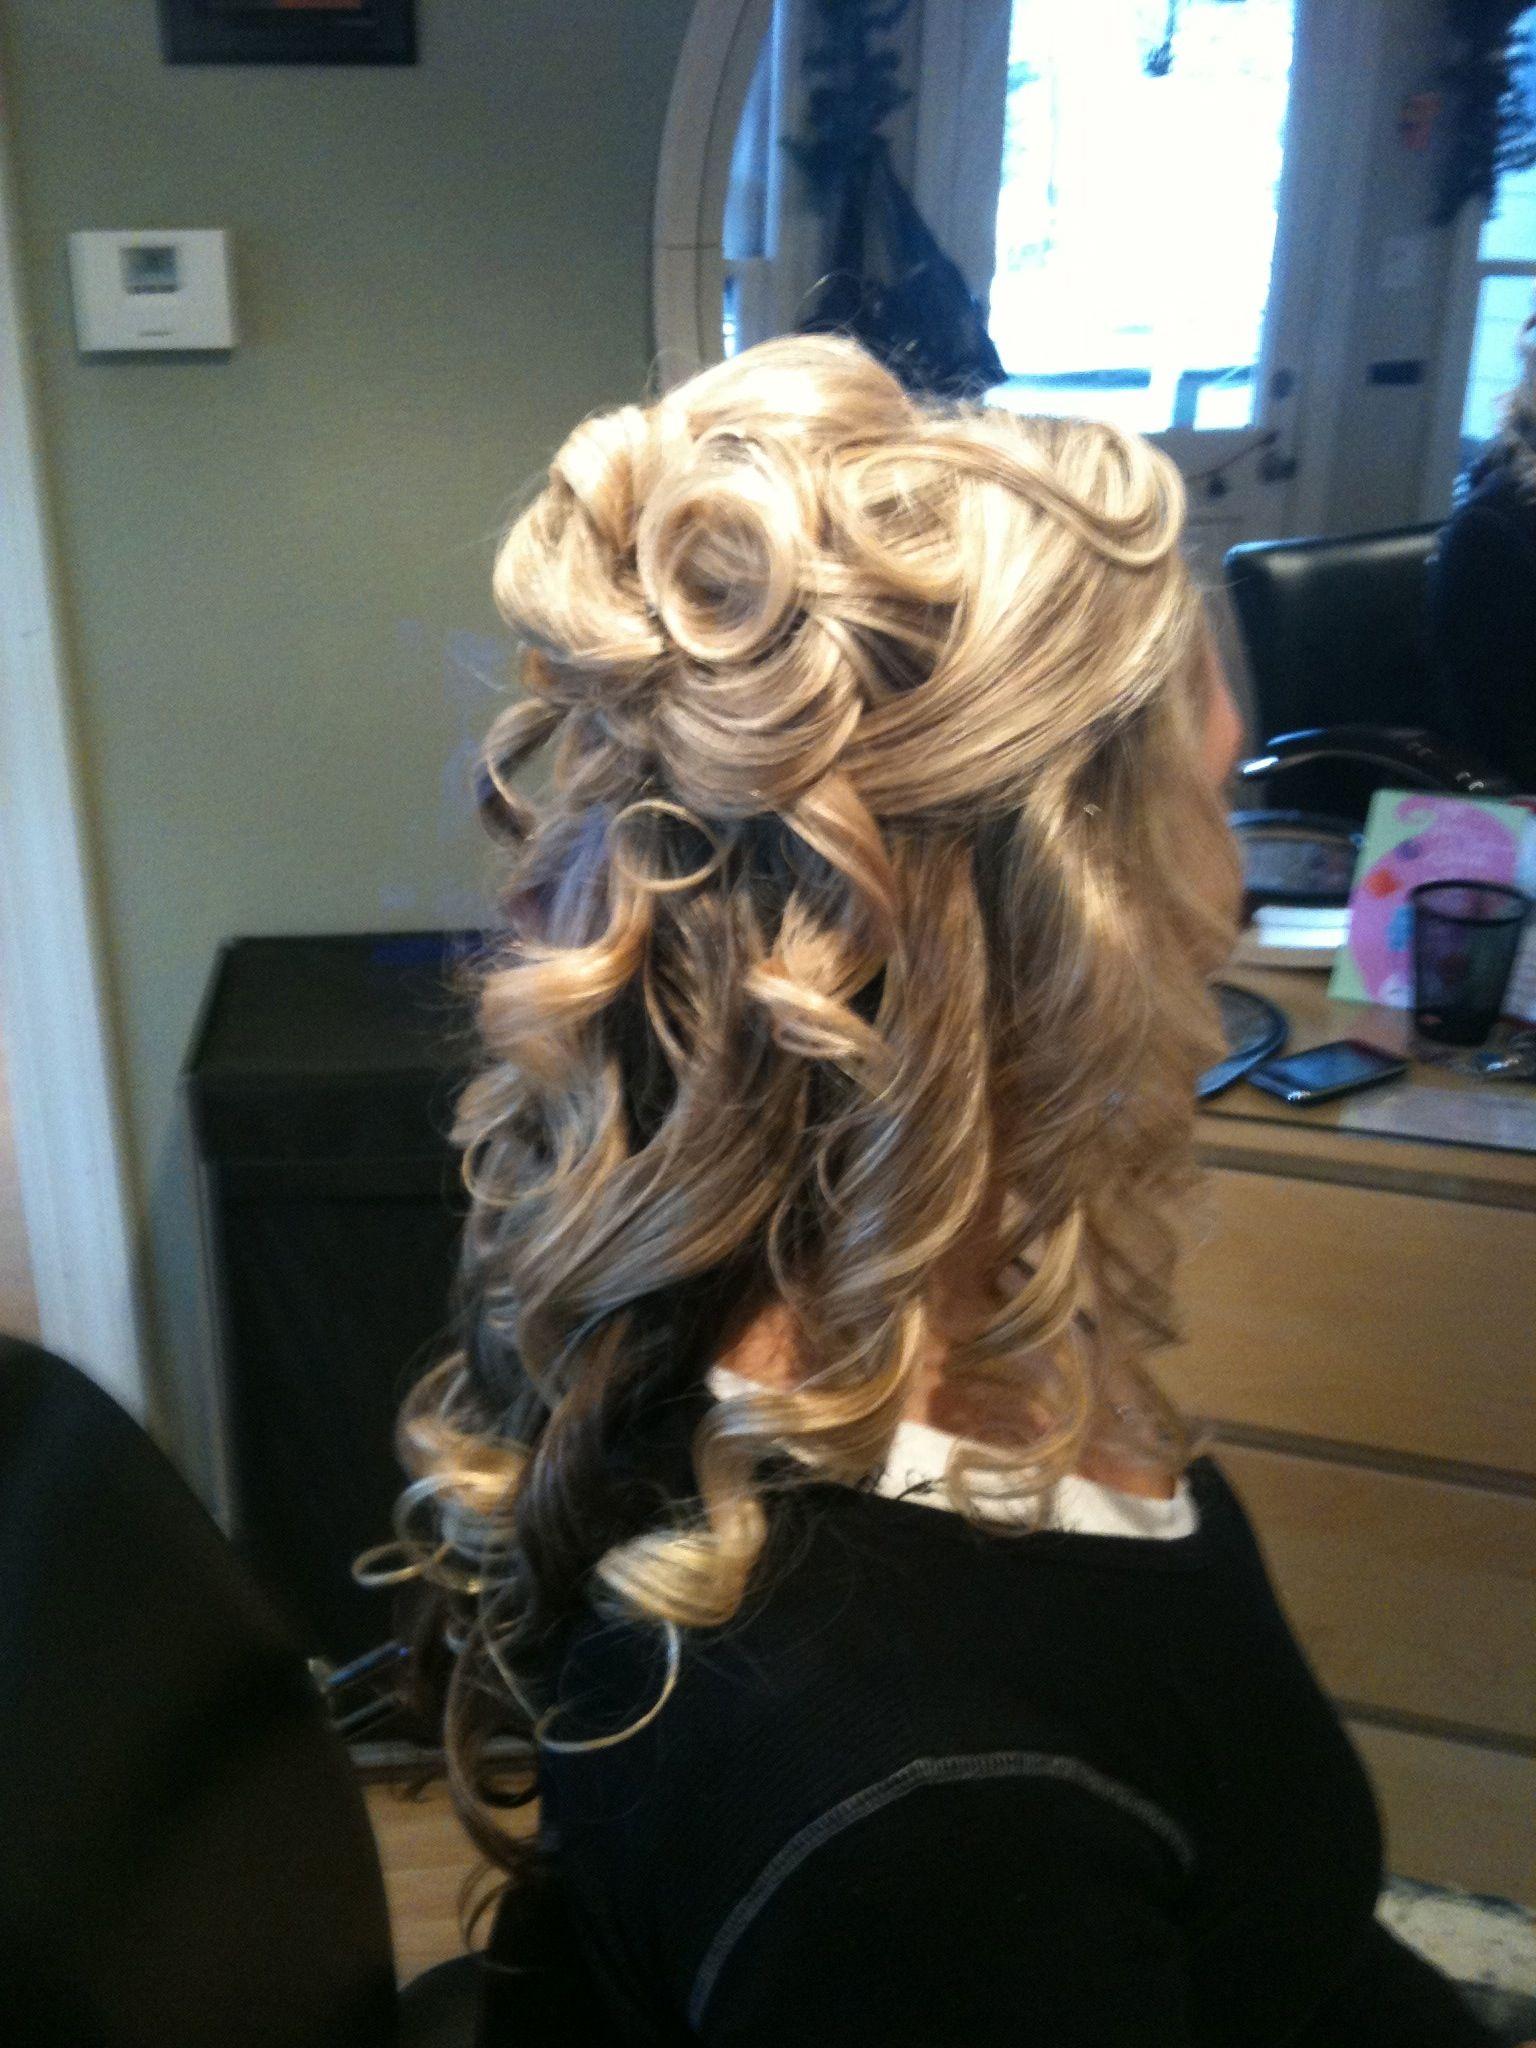 bridal hair partial updo - Google Search | Partial updo, Hair, Long hair styles